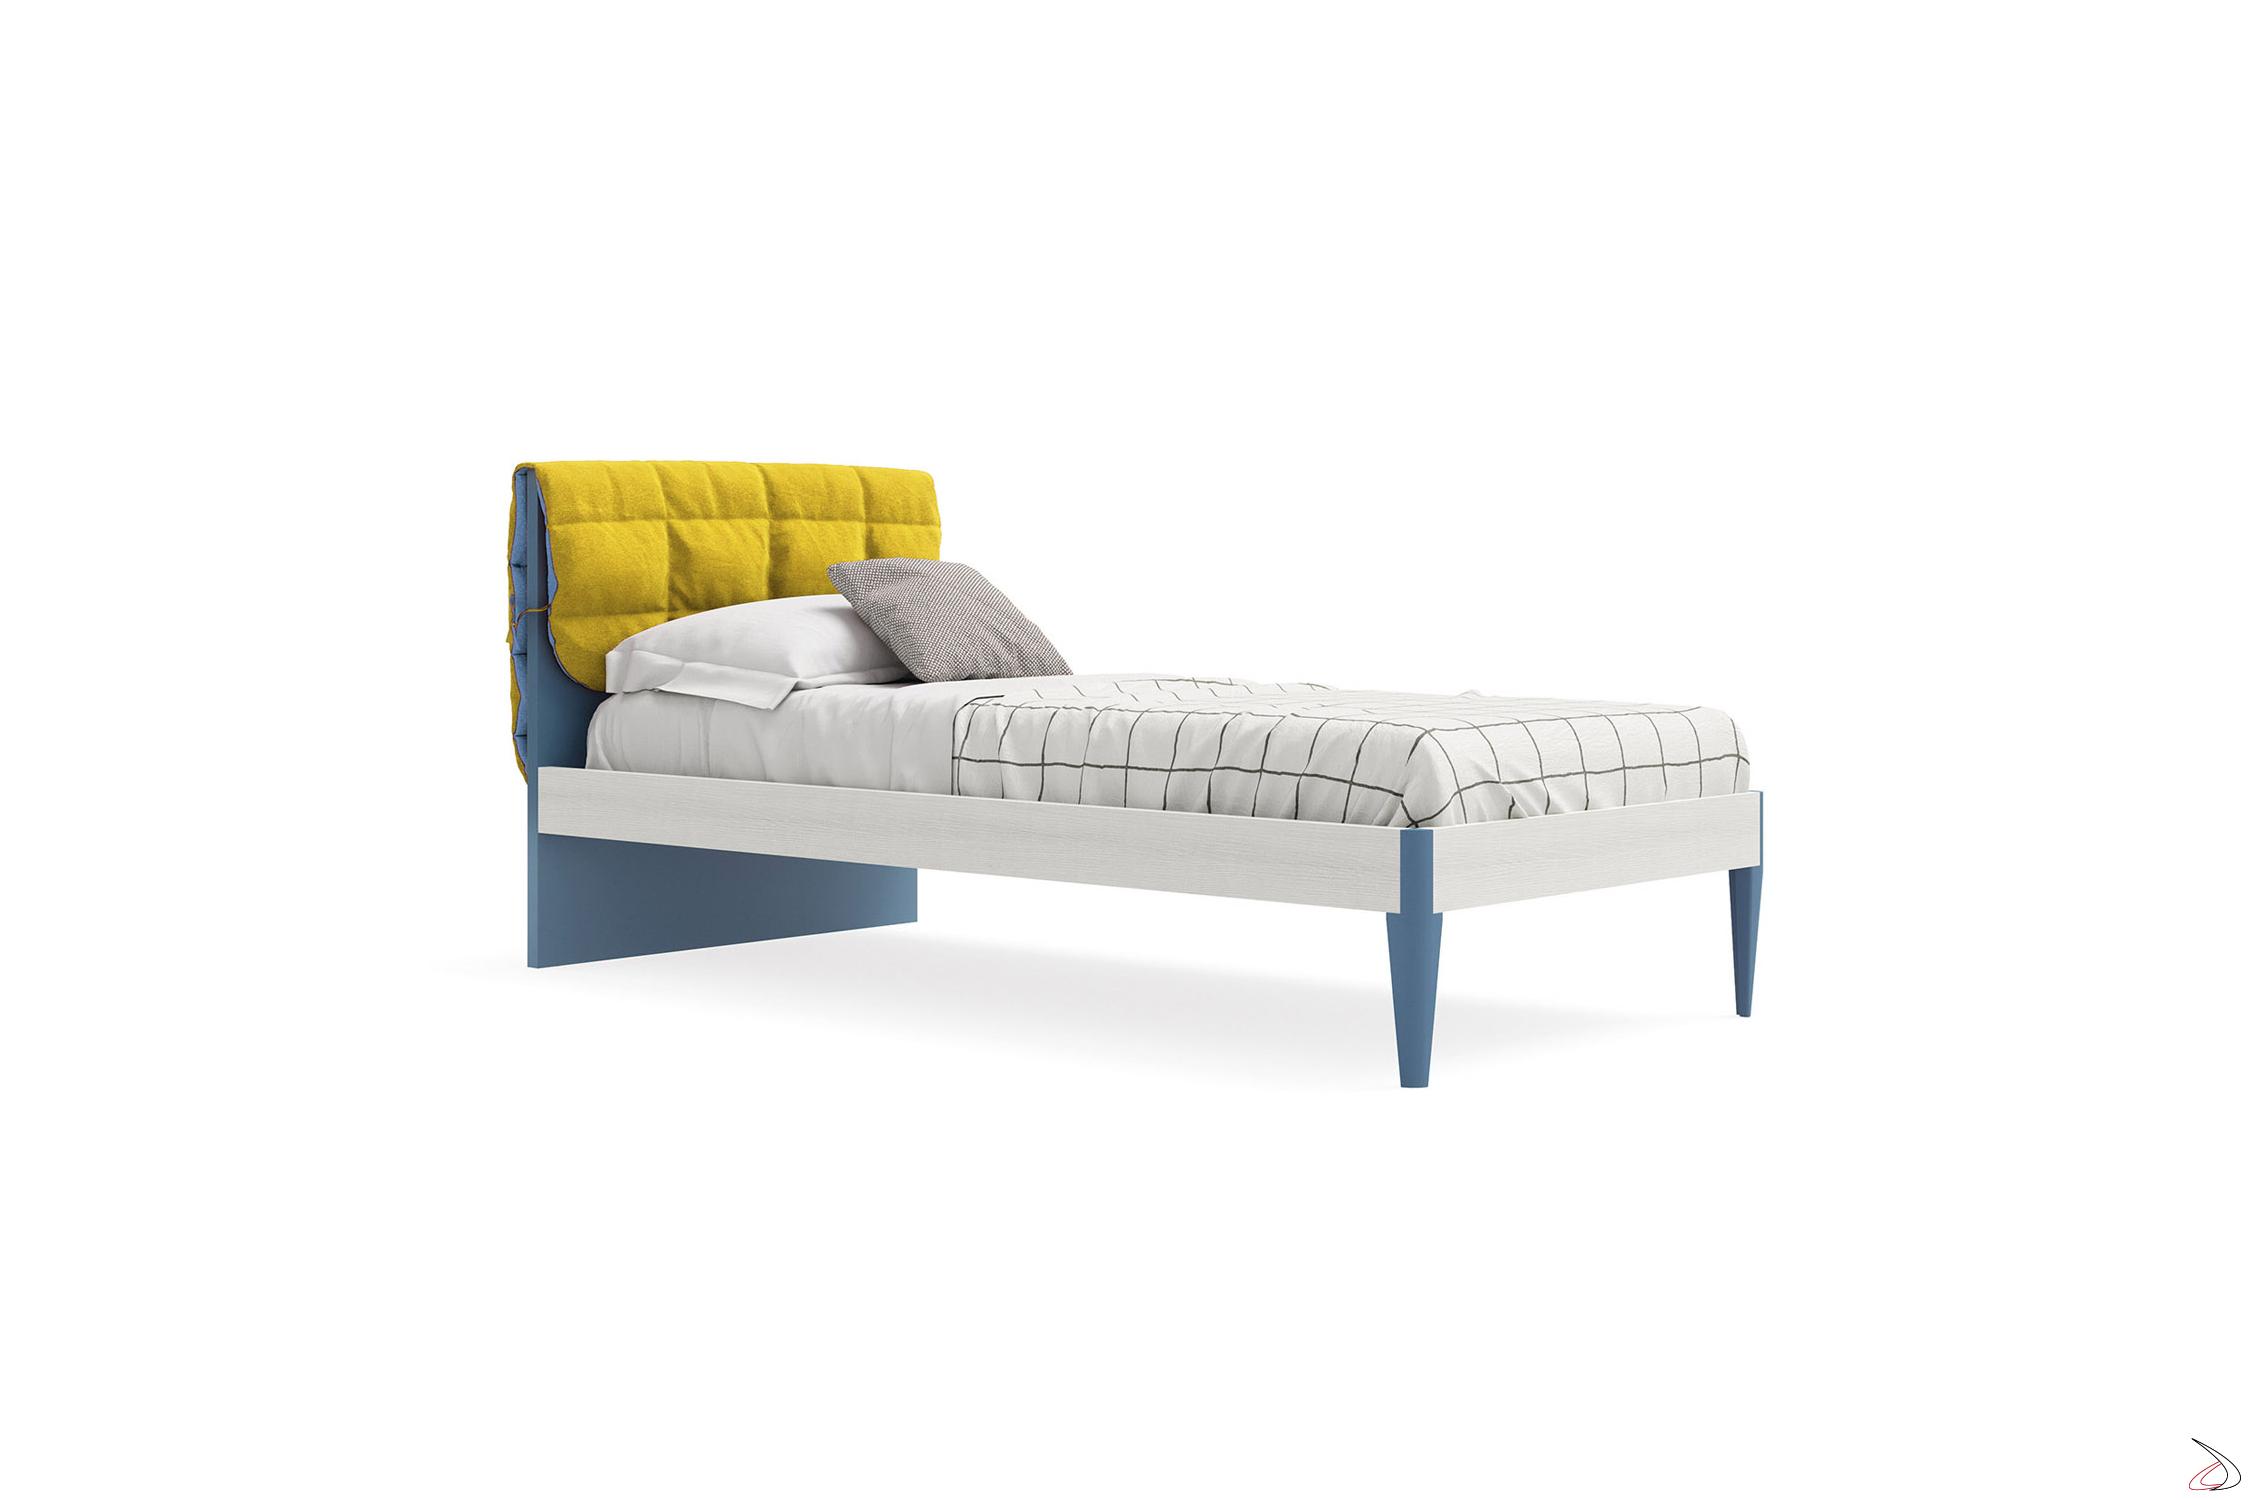 Testata Letto Bambina.Nuk Wooden Single Bed For Children Toparredi Arredo Design Online